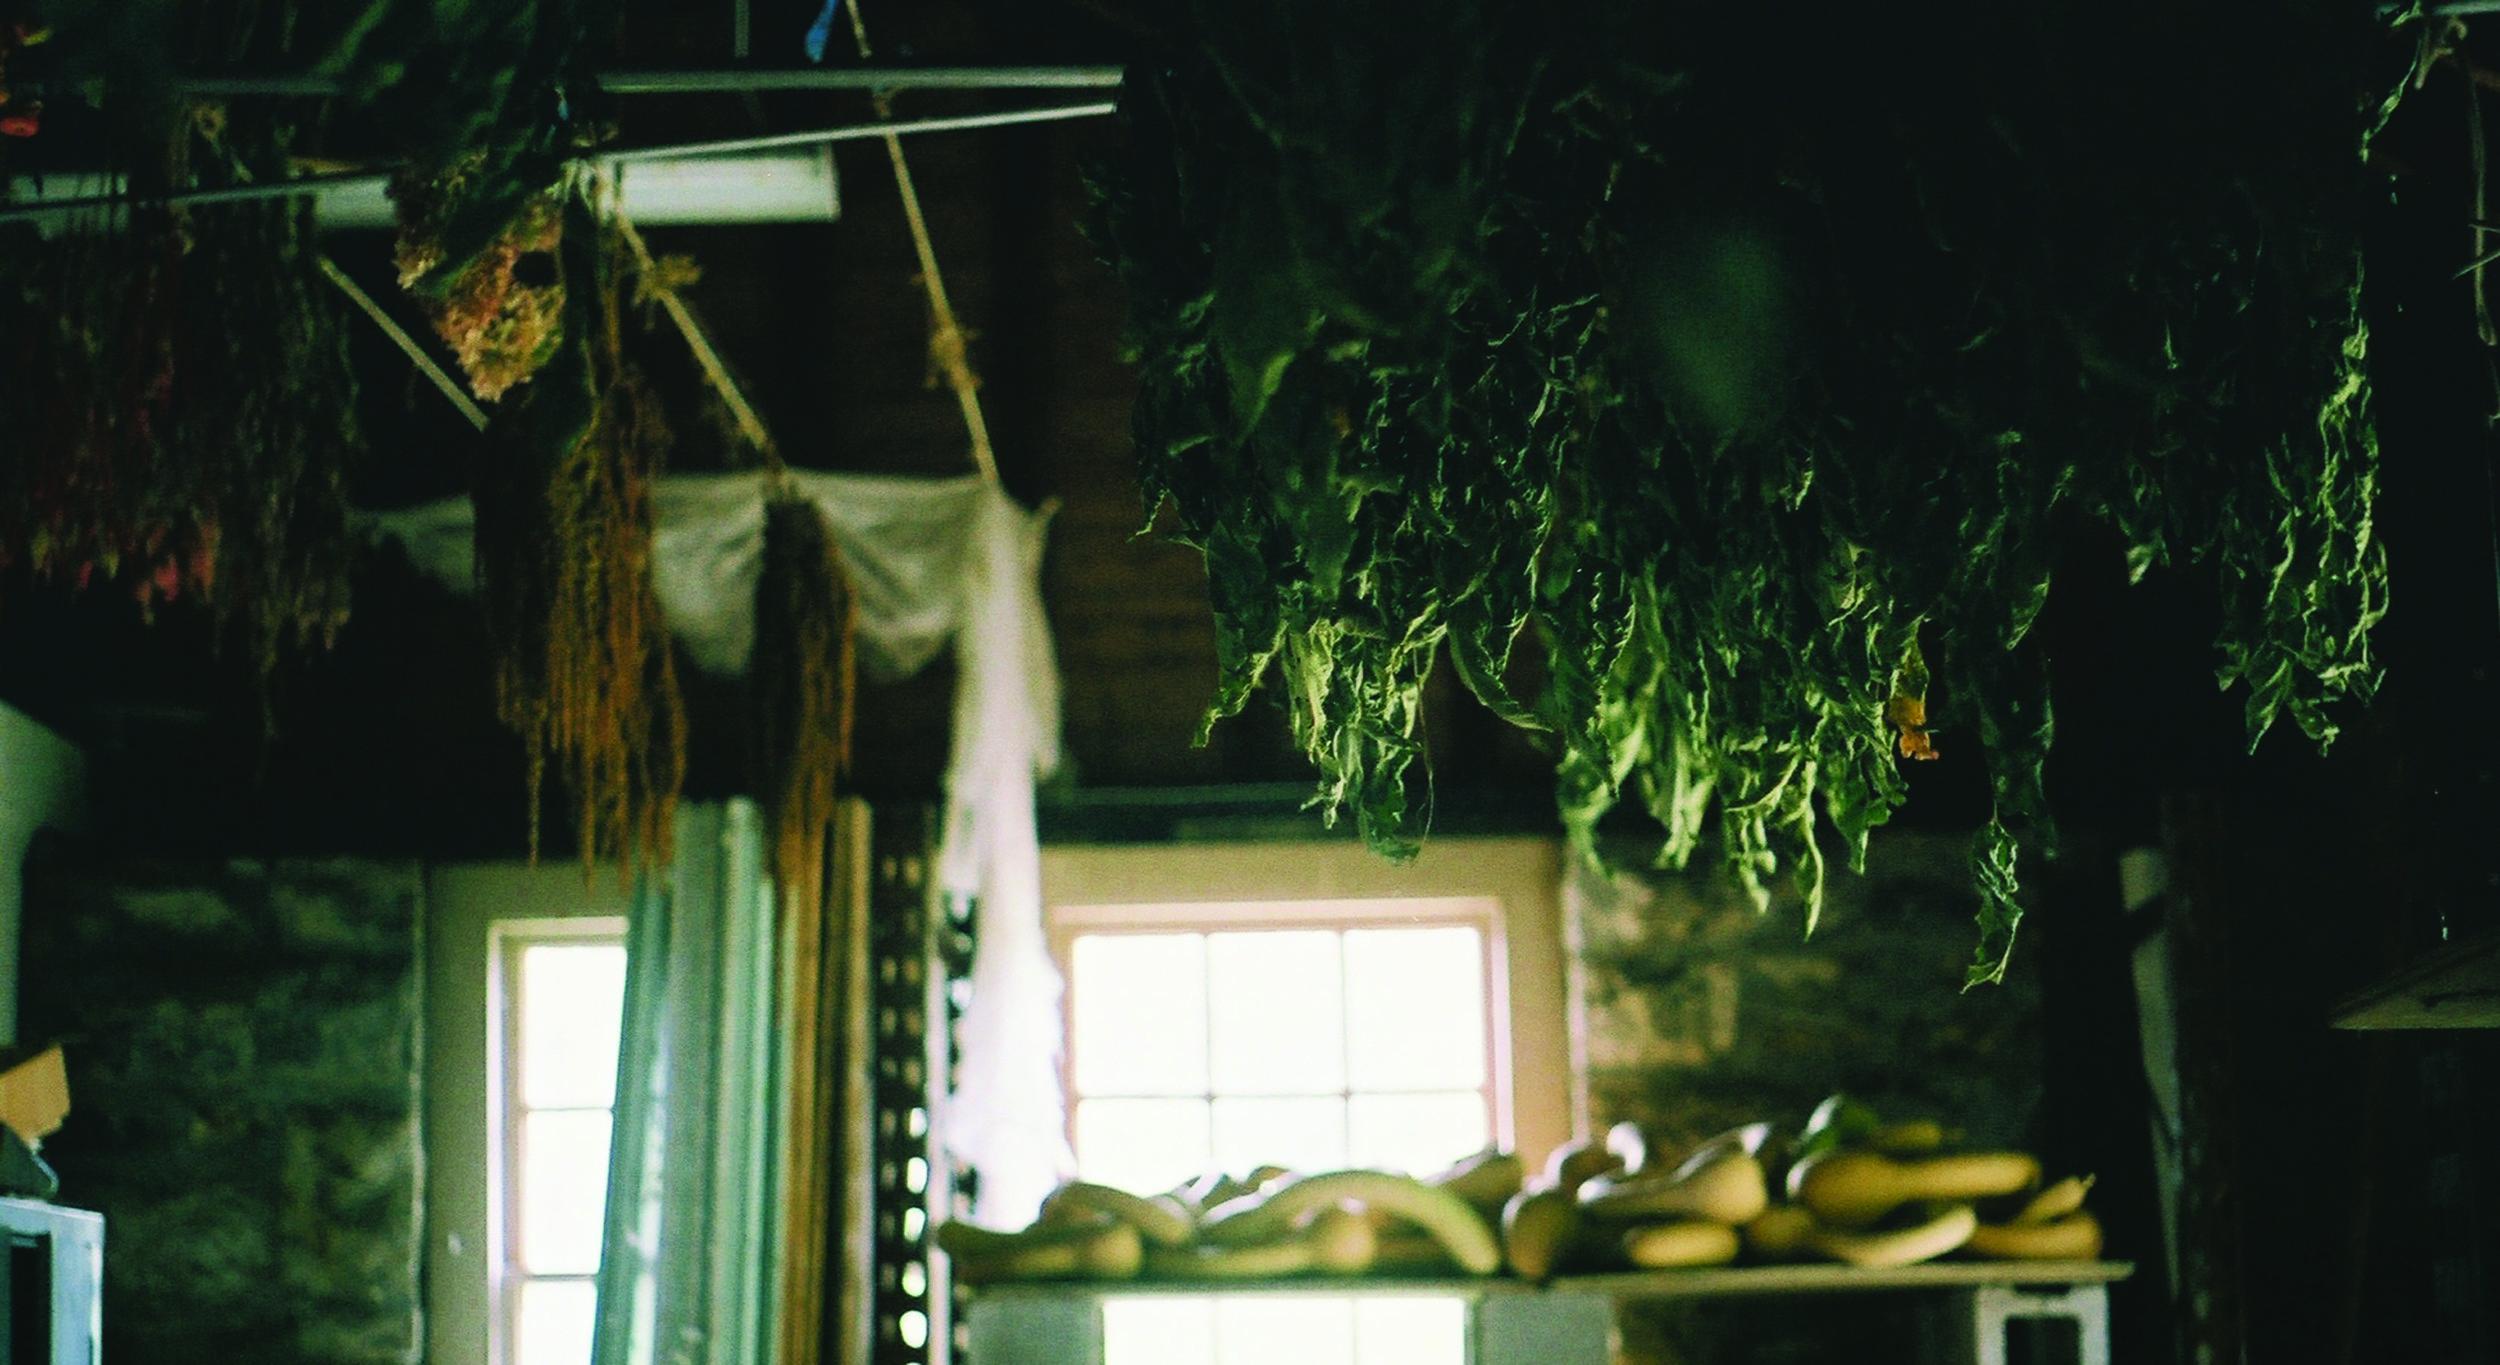 drying room - 1.jpg